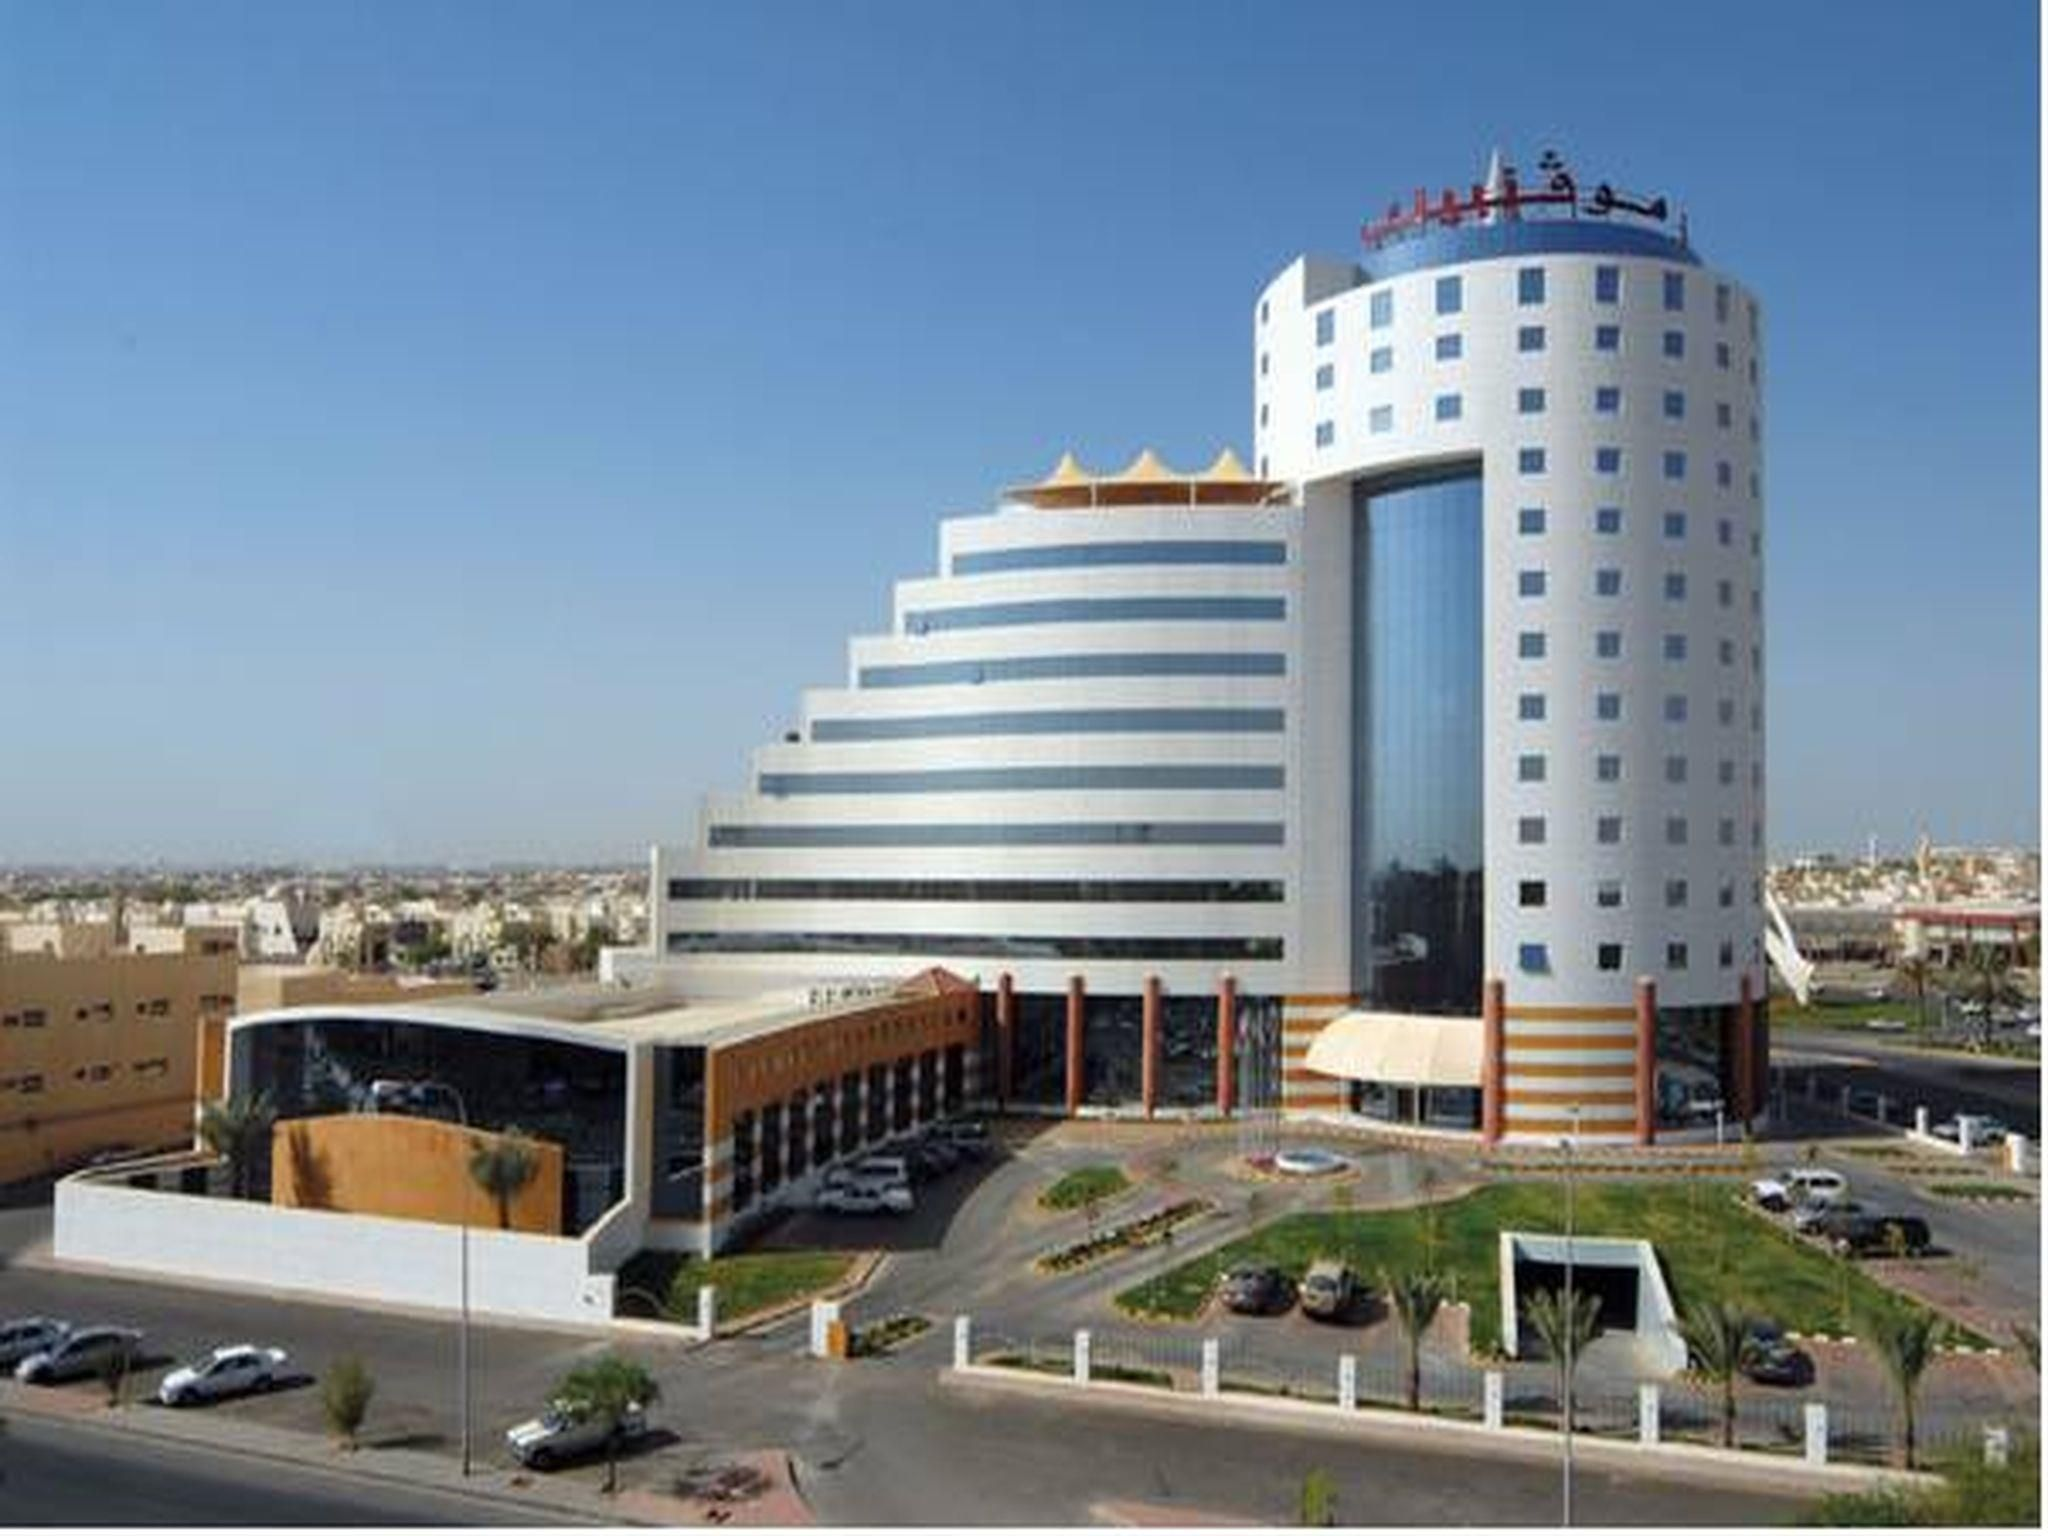 Al Muhaideb Hafr Al Batin Hotel Buraydah Movenpick Hotel Qassim Saudi Arabia Middle East The 5